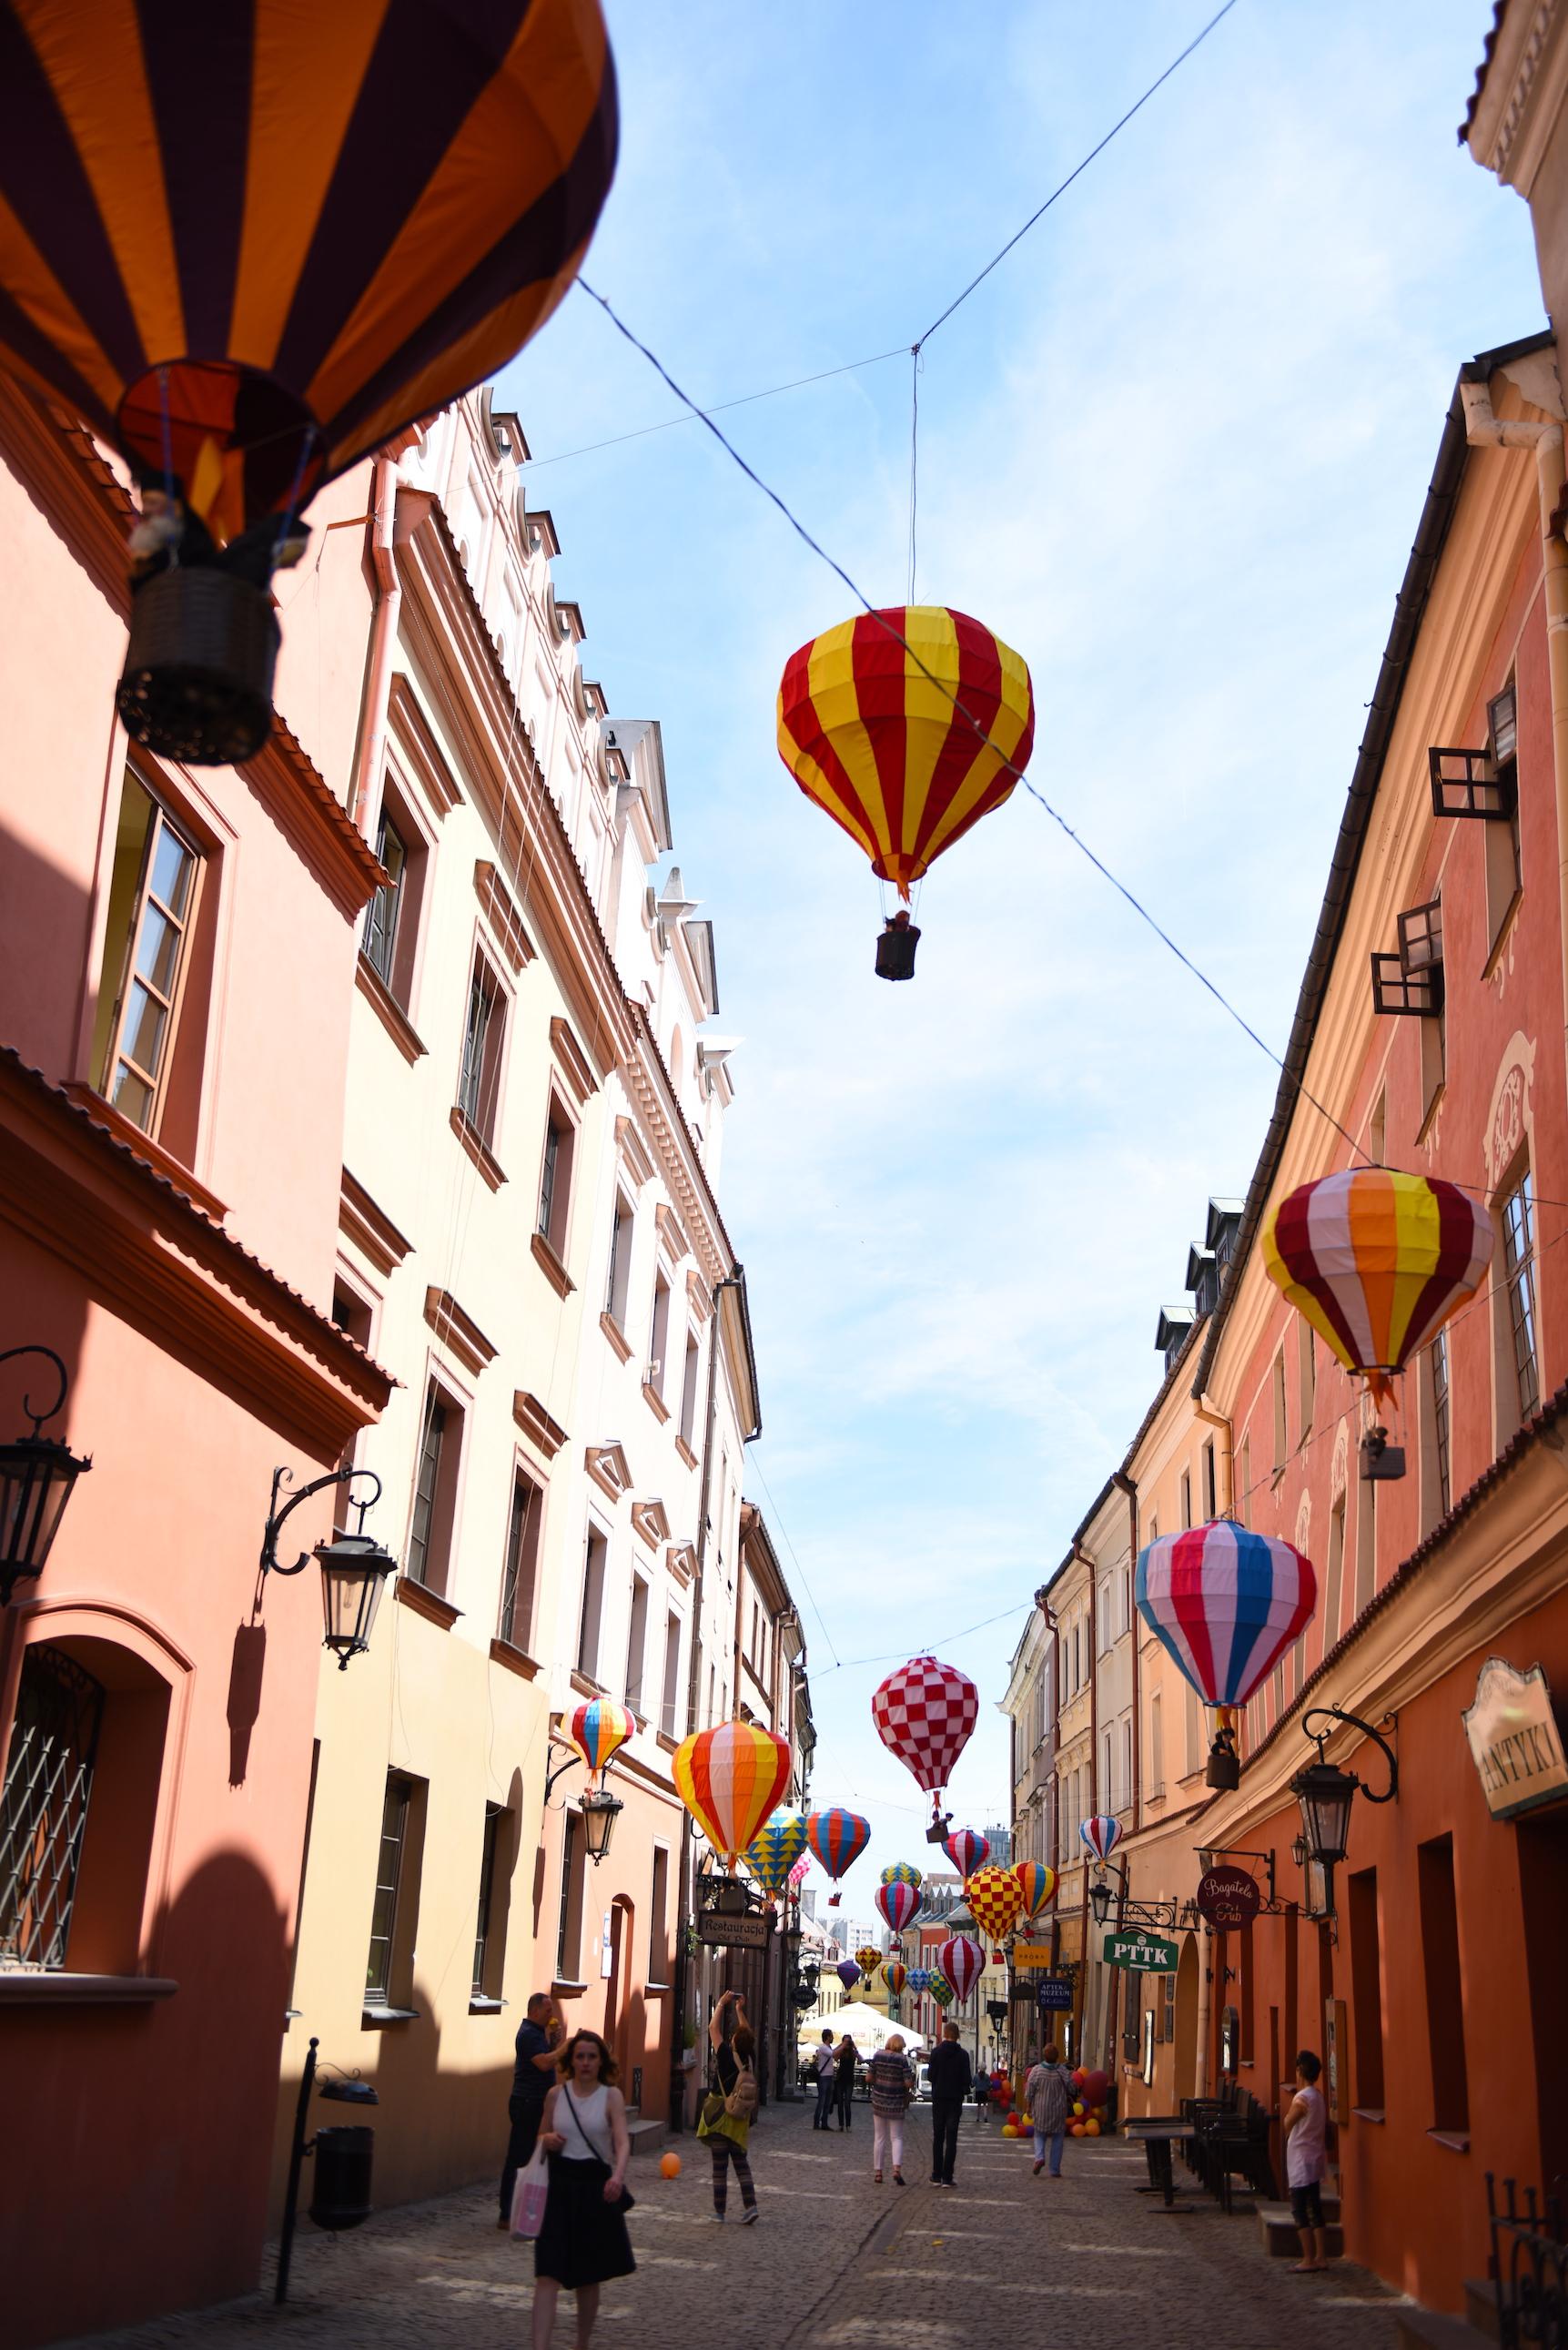 balony lublin ulica